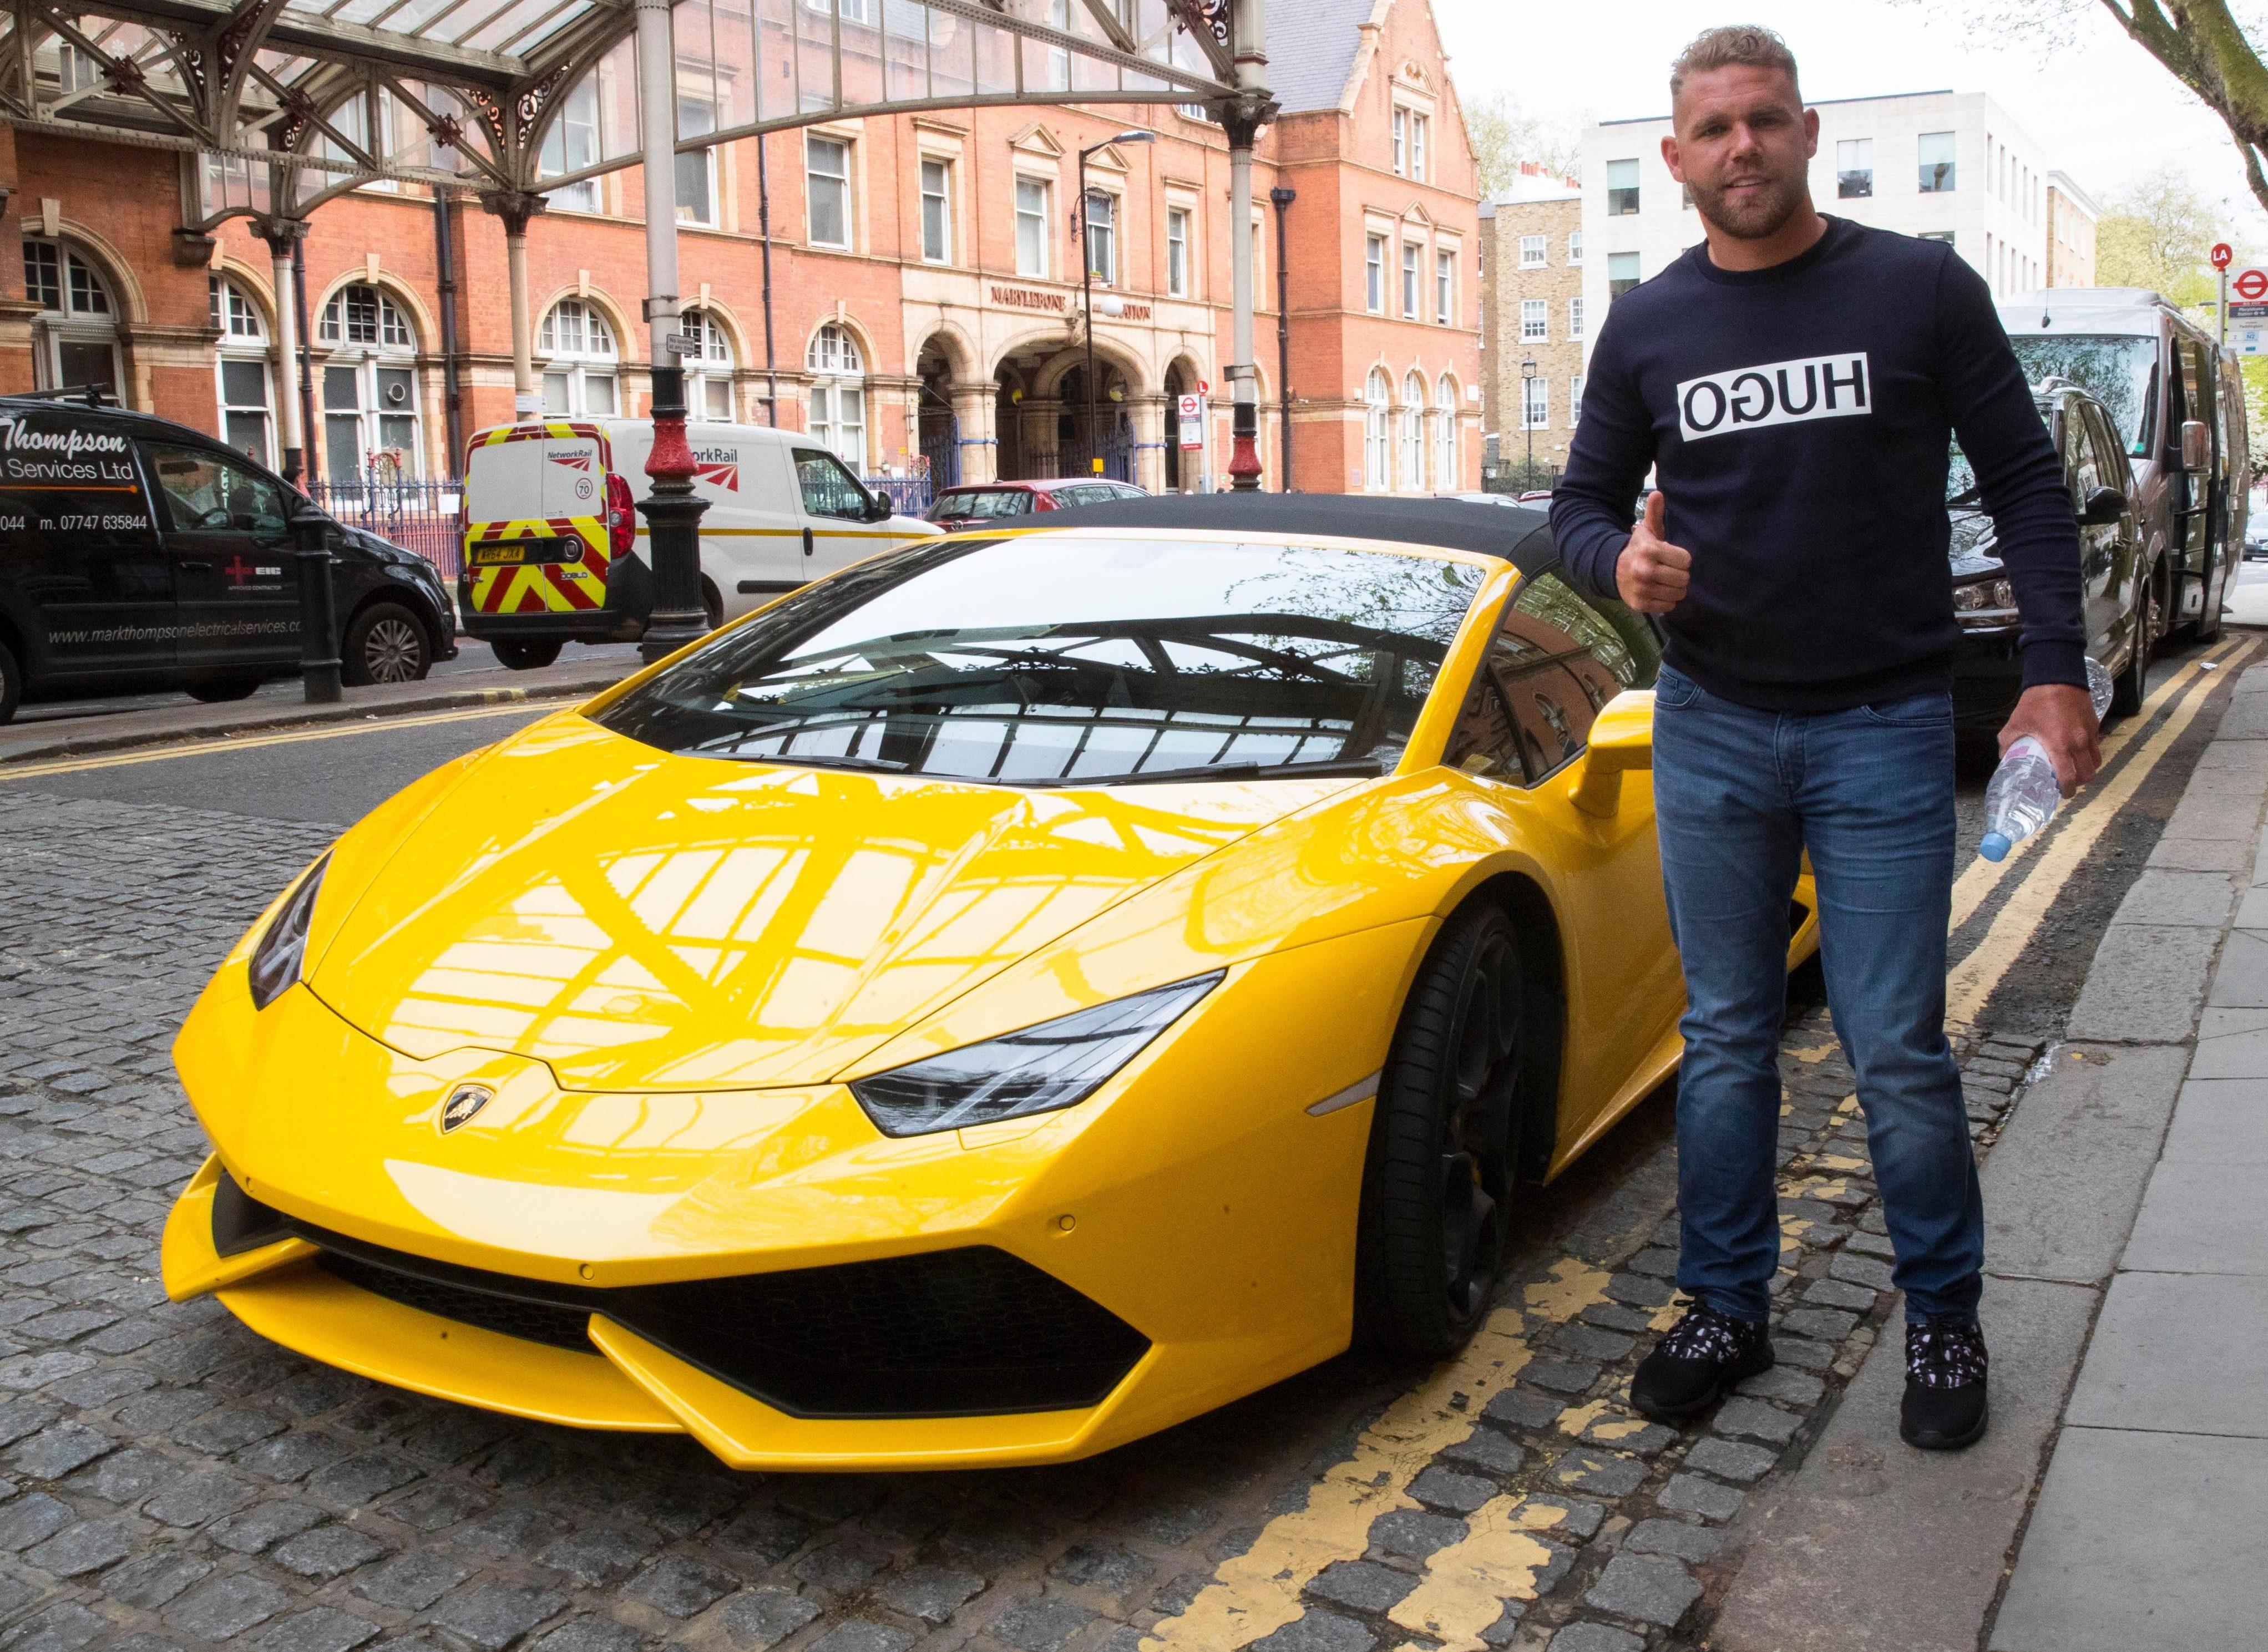 Billy Joe Saunders gives a thumbs up as he picks up his Lamborghini outside Marylebone station